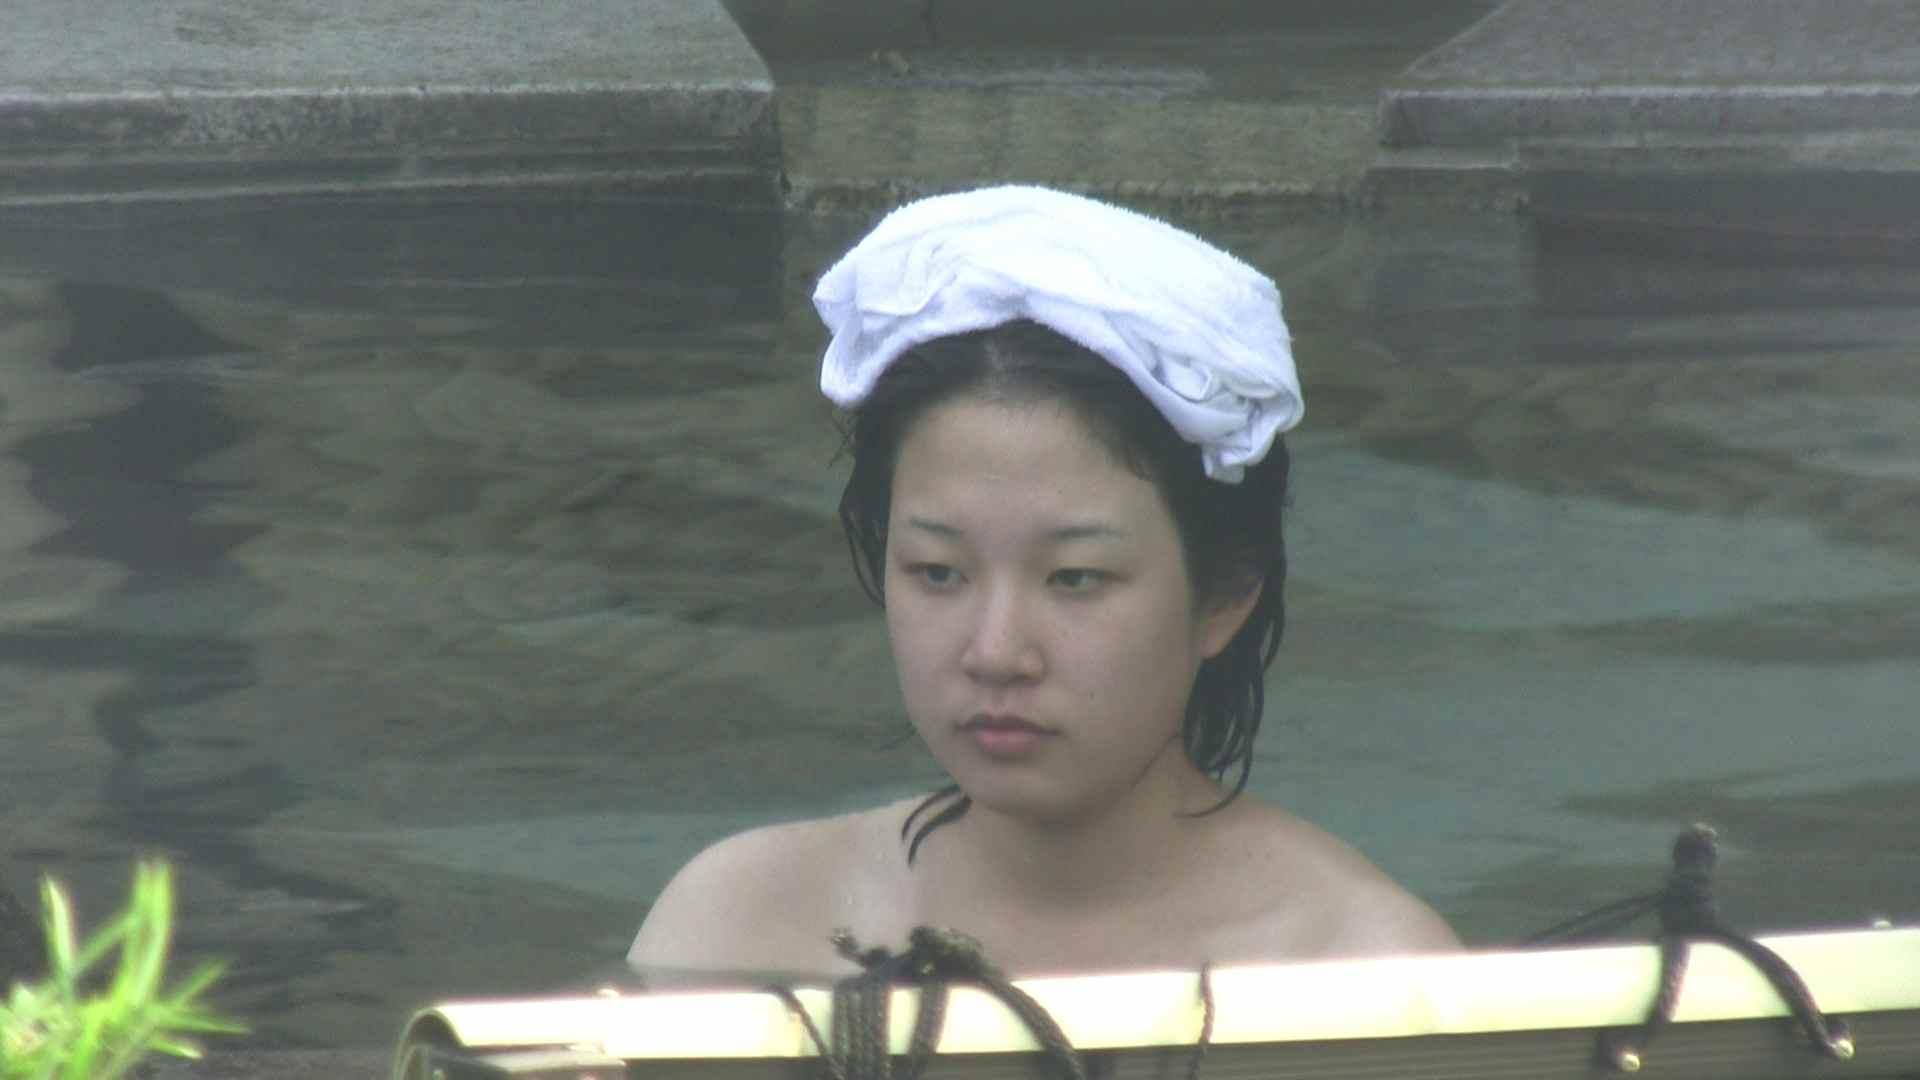 Aquaな露天風呂Vol.172 盗撮   HなOL  55pic 25